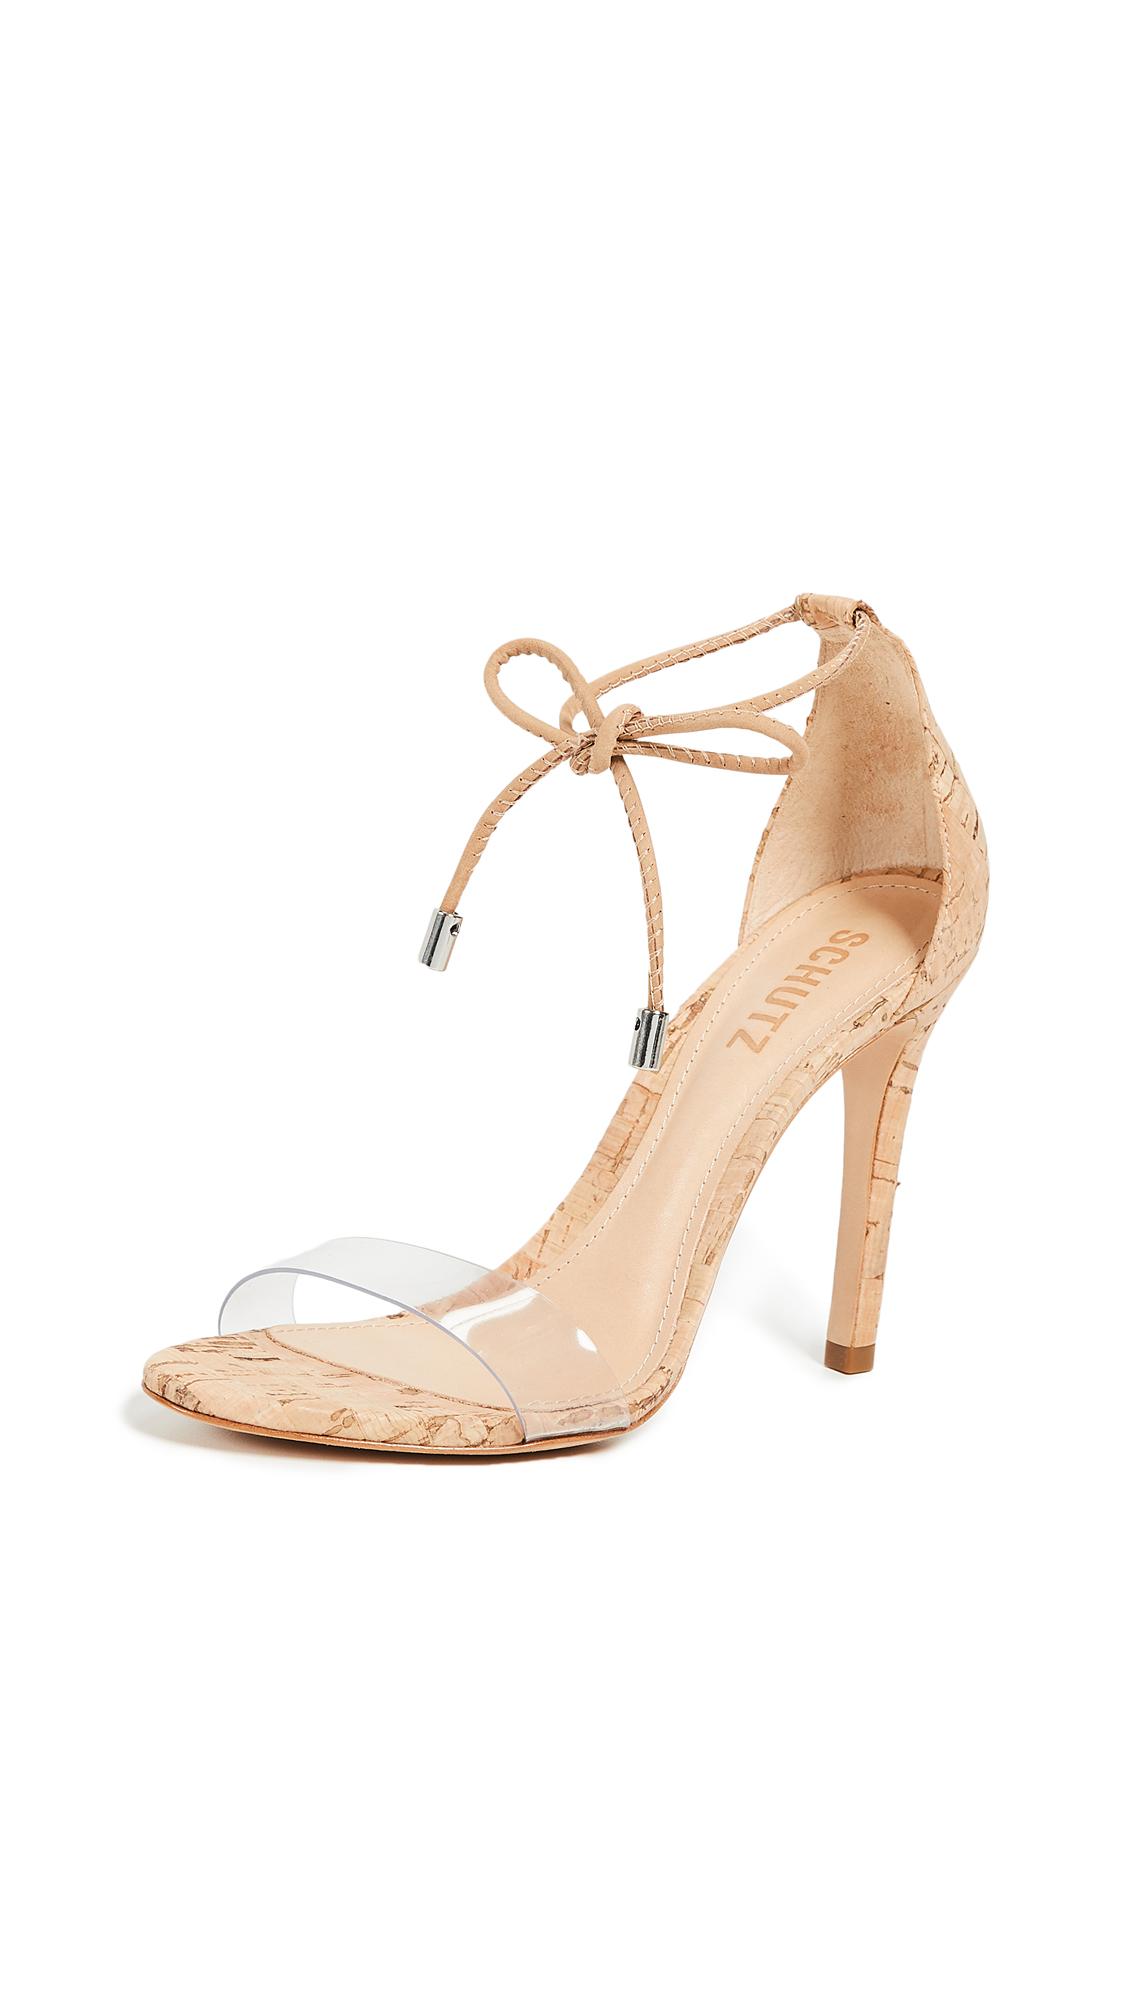 Schutz Joseanna Sandals - Natural